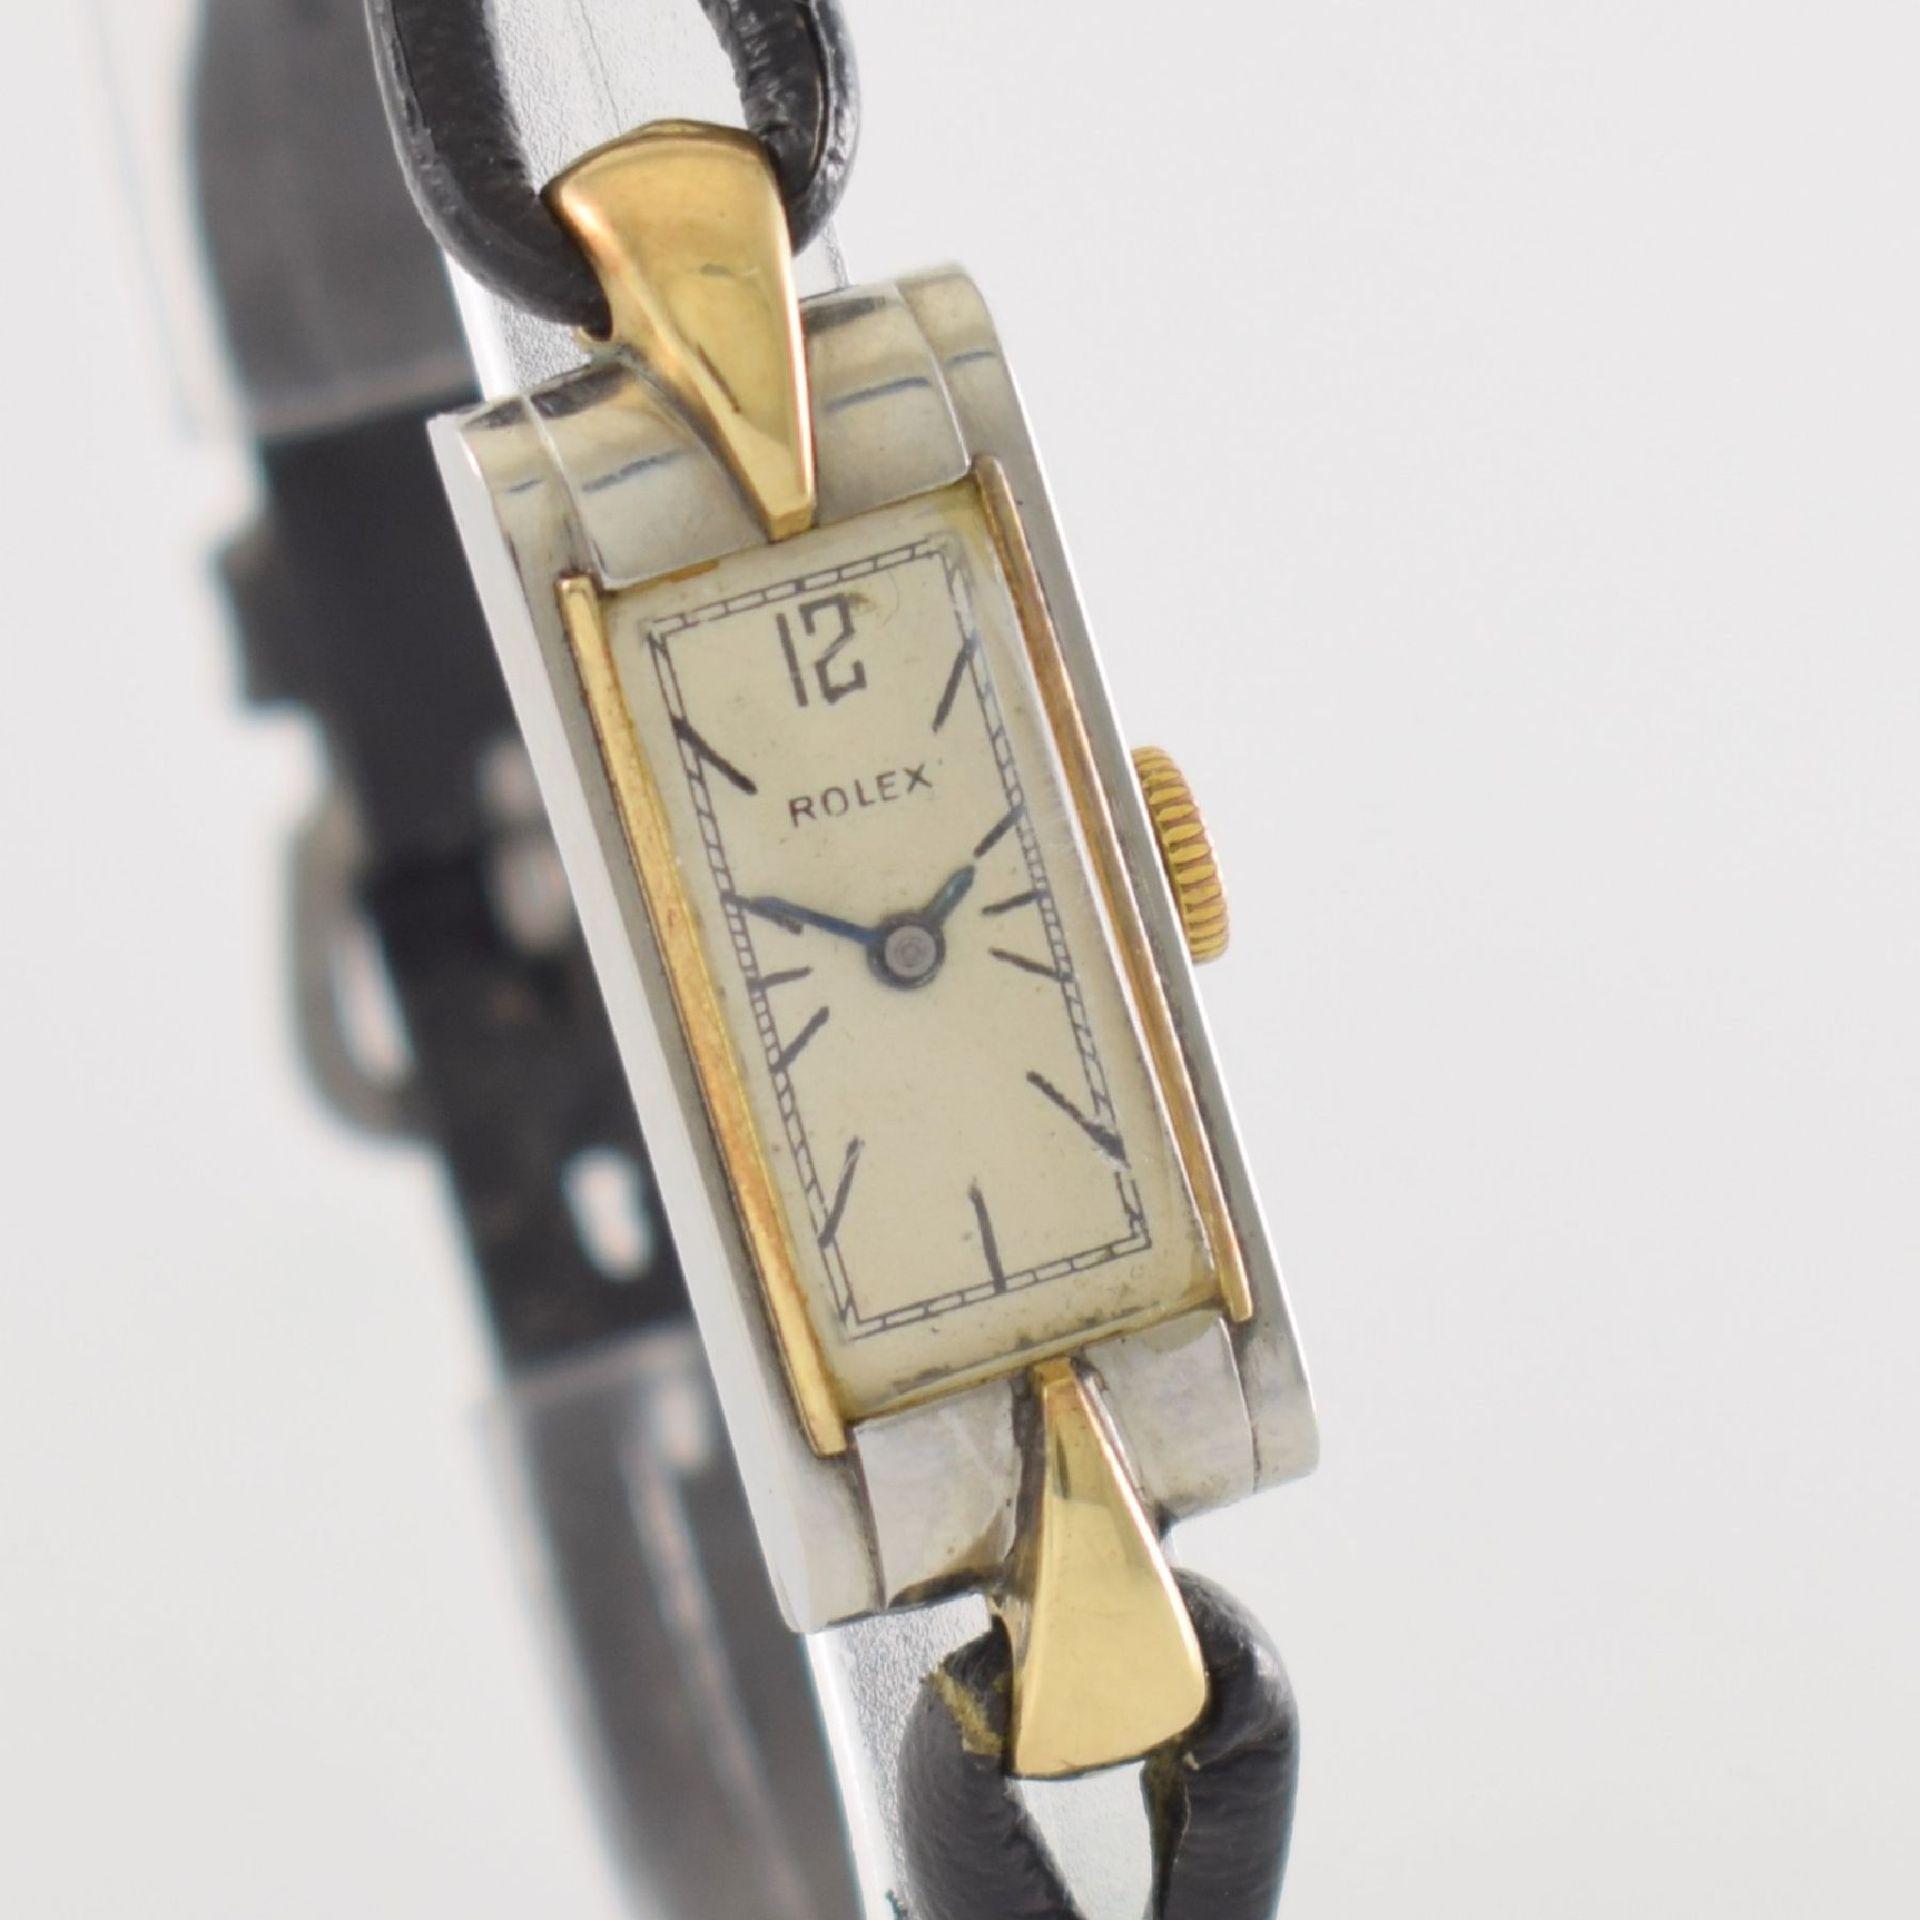 ROLEX Princess Damenarmbanduhr Ref. 1876 in Stahl/Gold, Schweiz um 1935, Handaufzug, rechteck. - Bild 6 aus 8